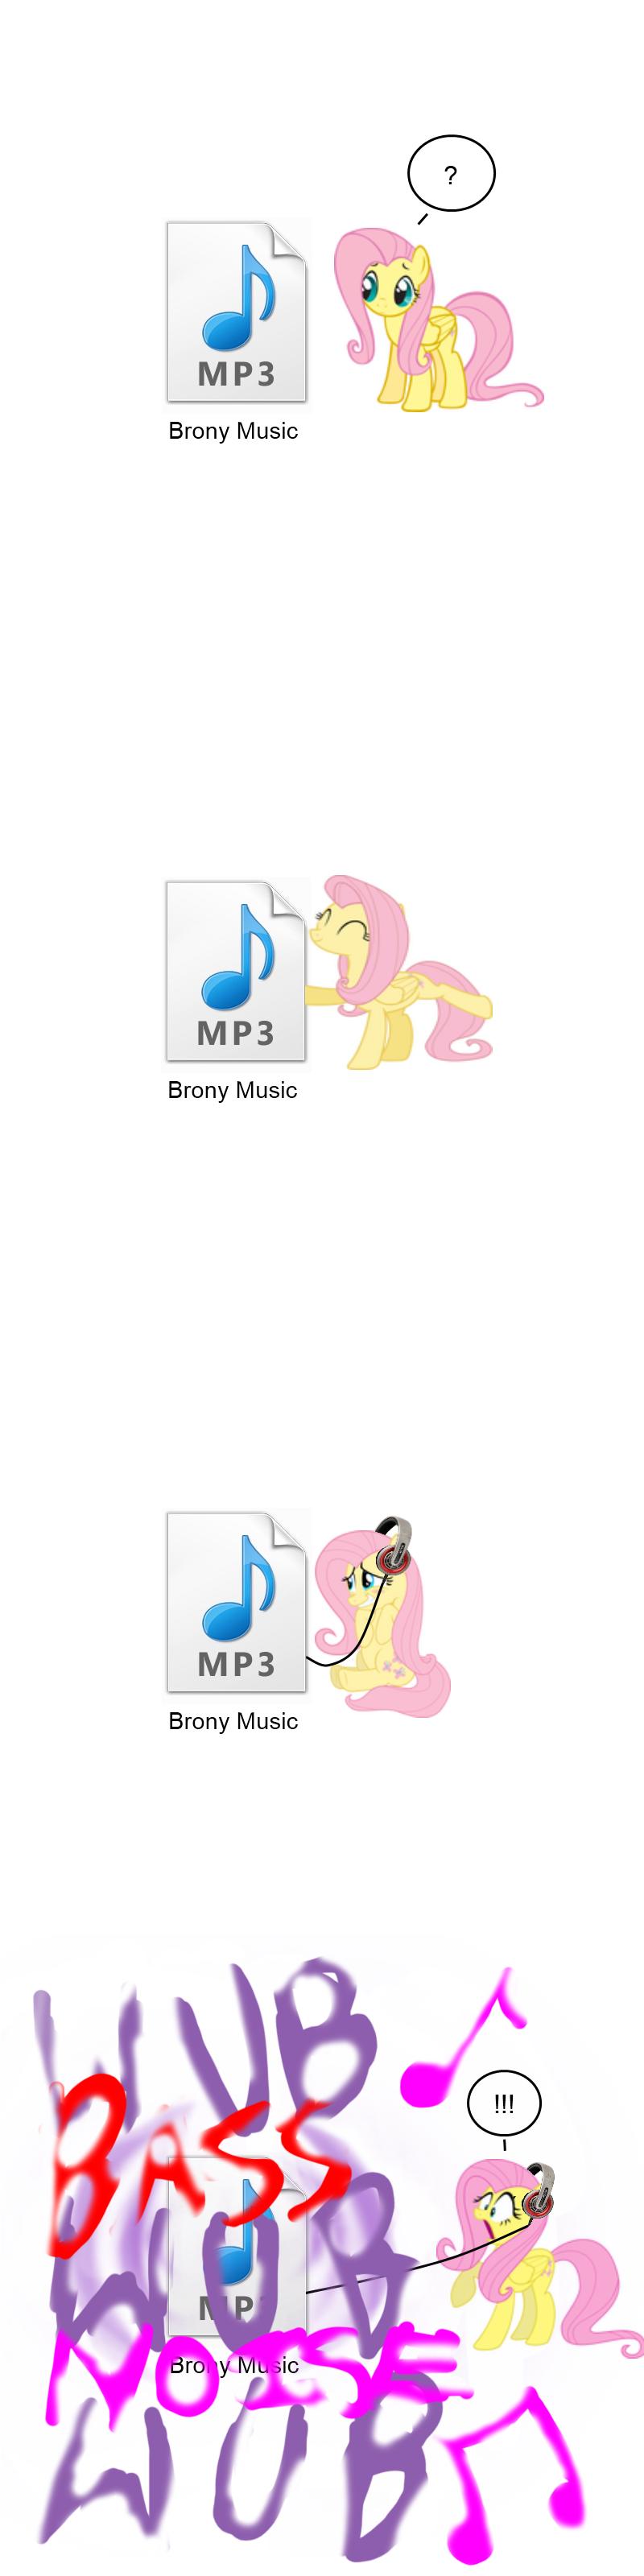 Brony Music by Shadestars